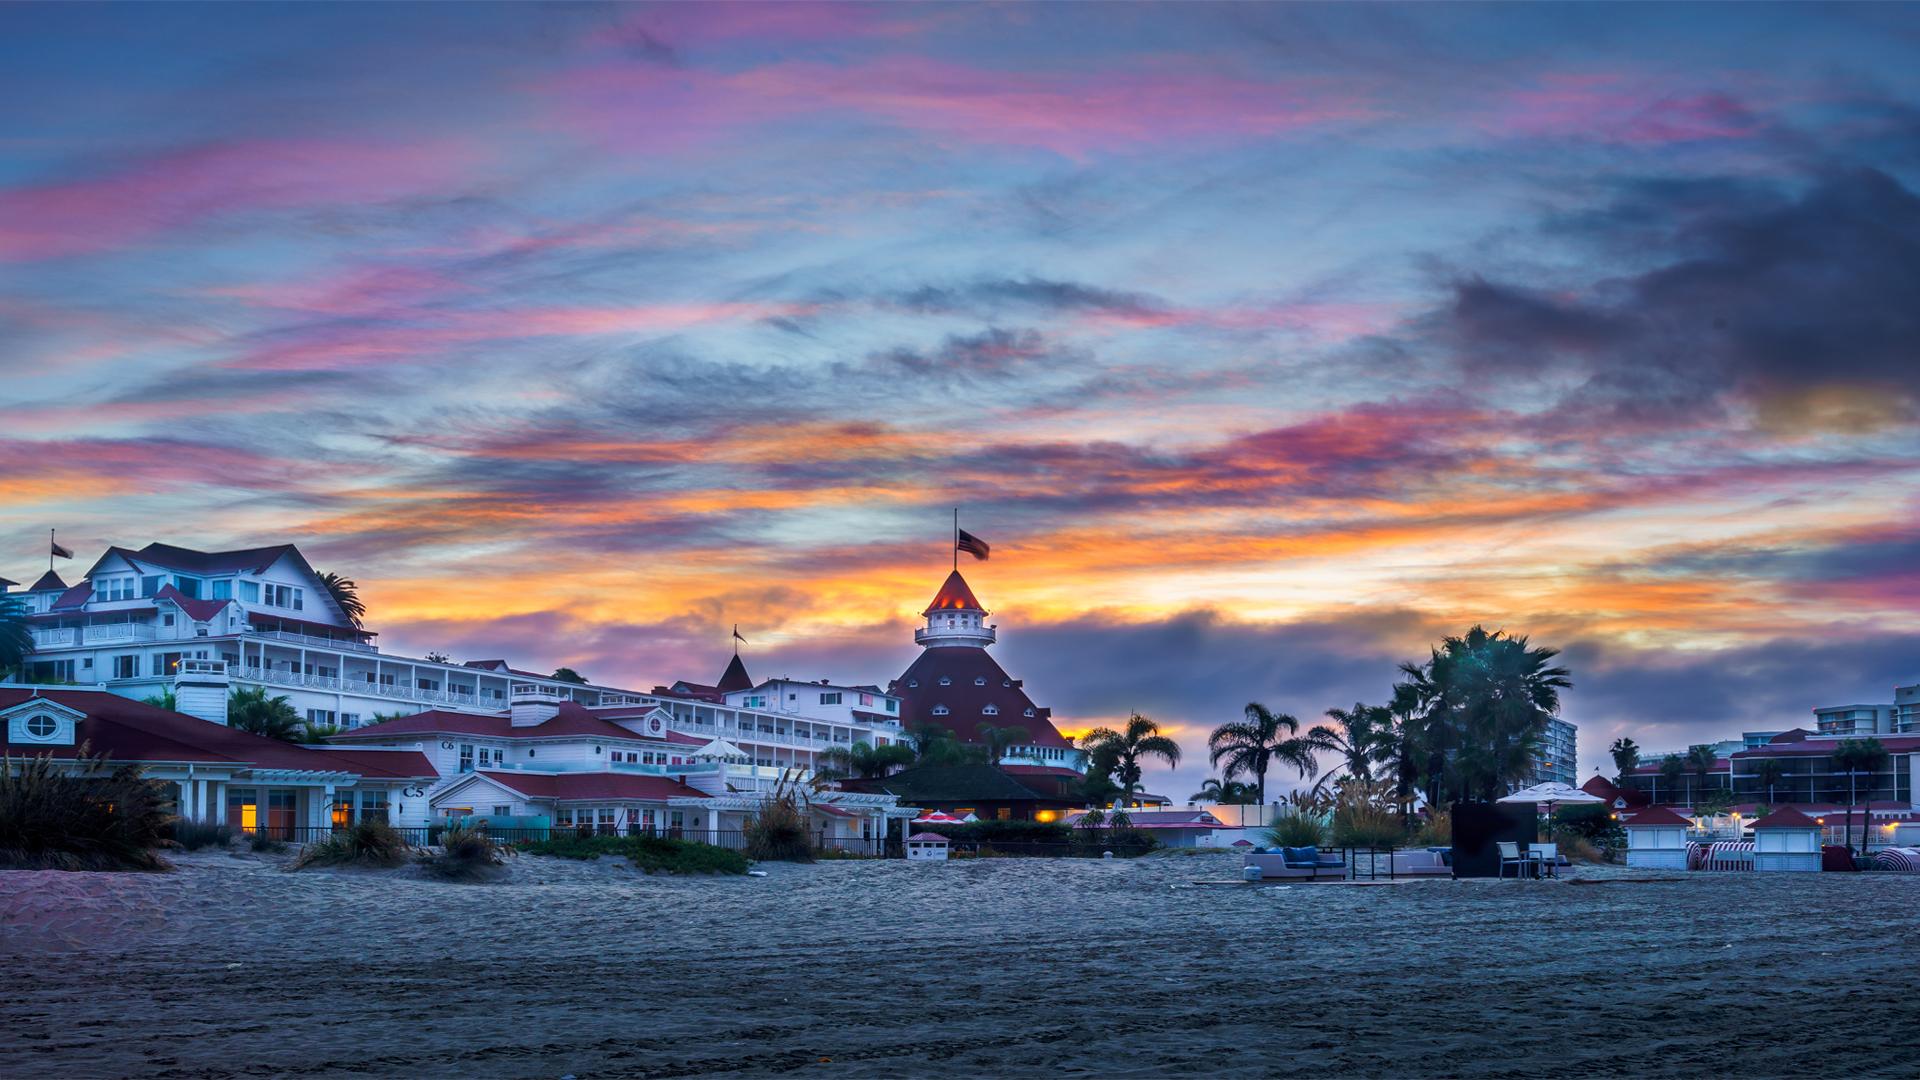 Sunrise Hotel Del4 2016